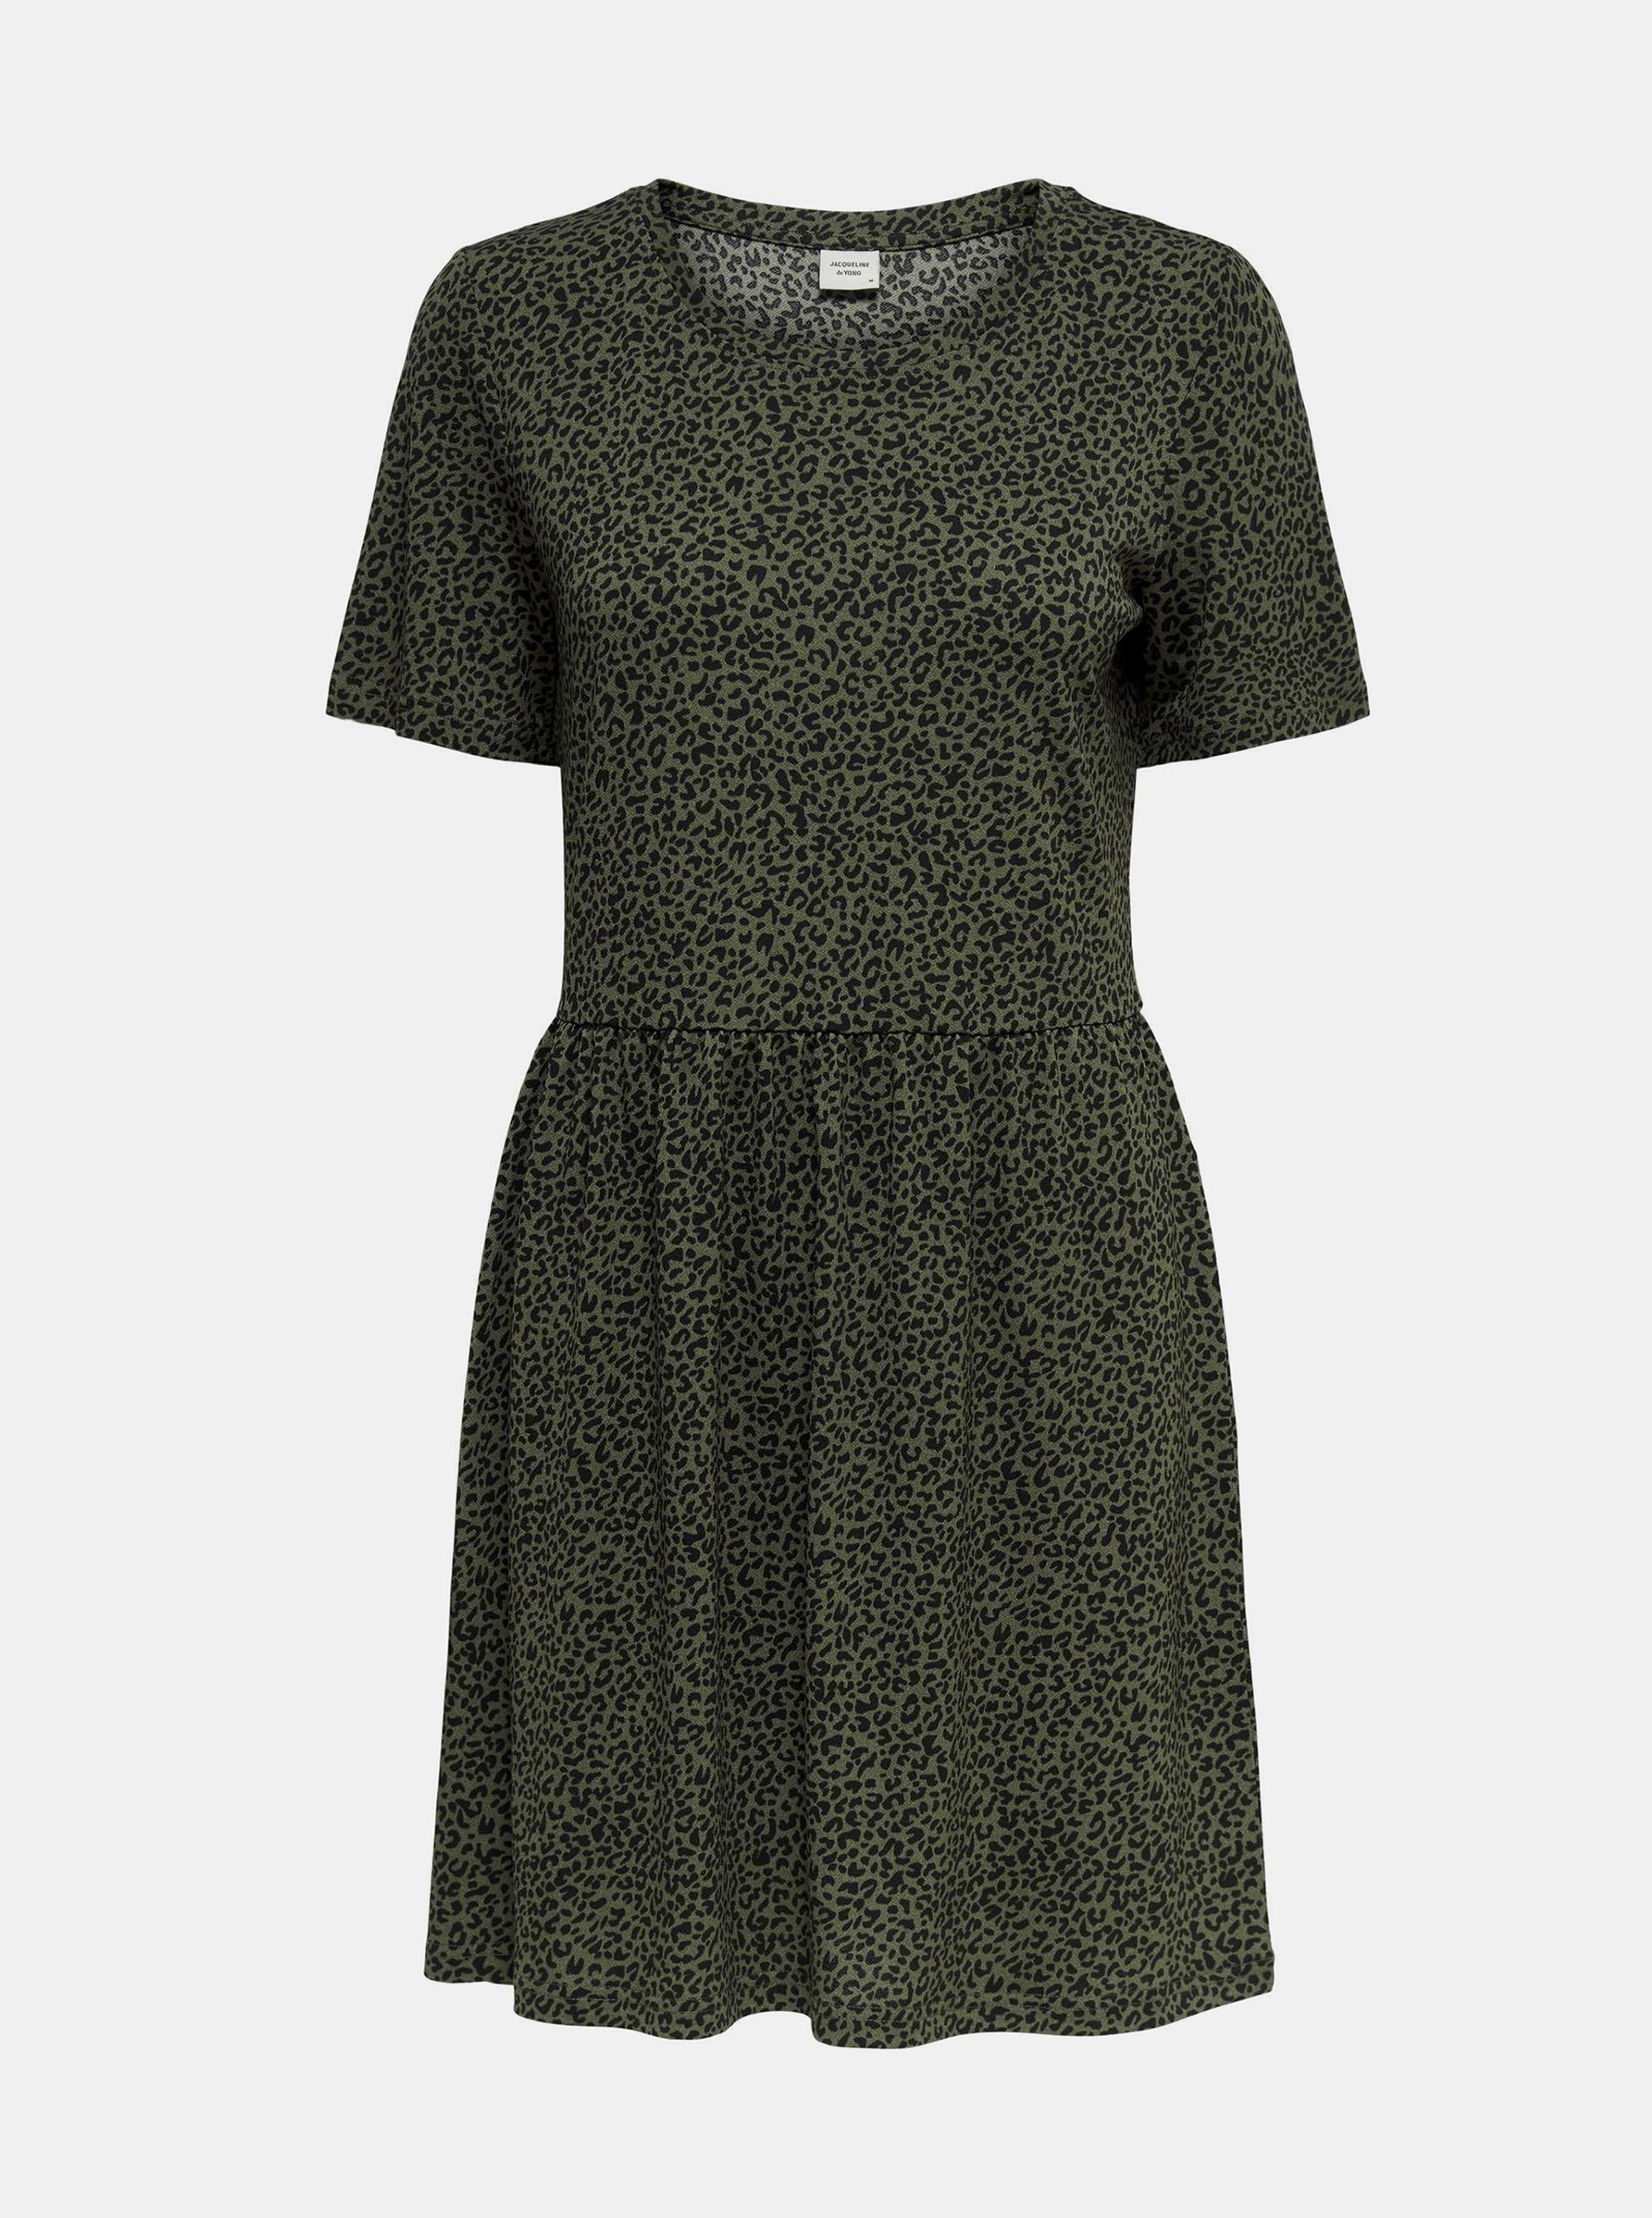 Jacqueline de Yong green dress patterned